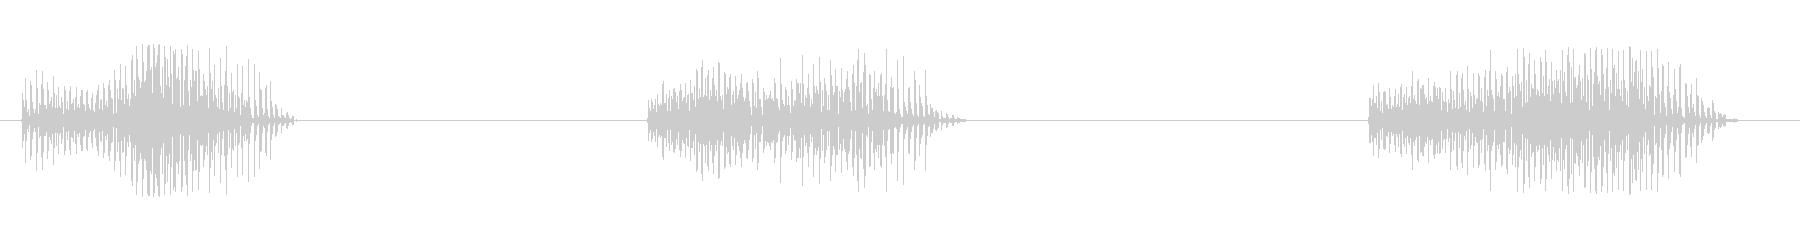 Vibraslap:3つの短い高速ラトルの未再生の波形